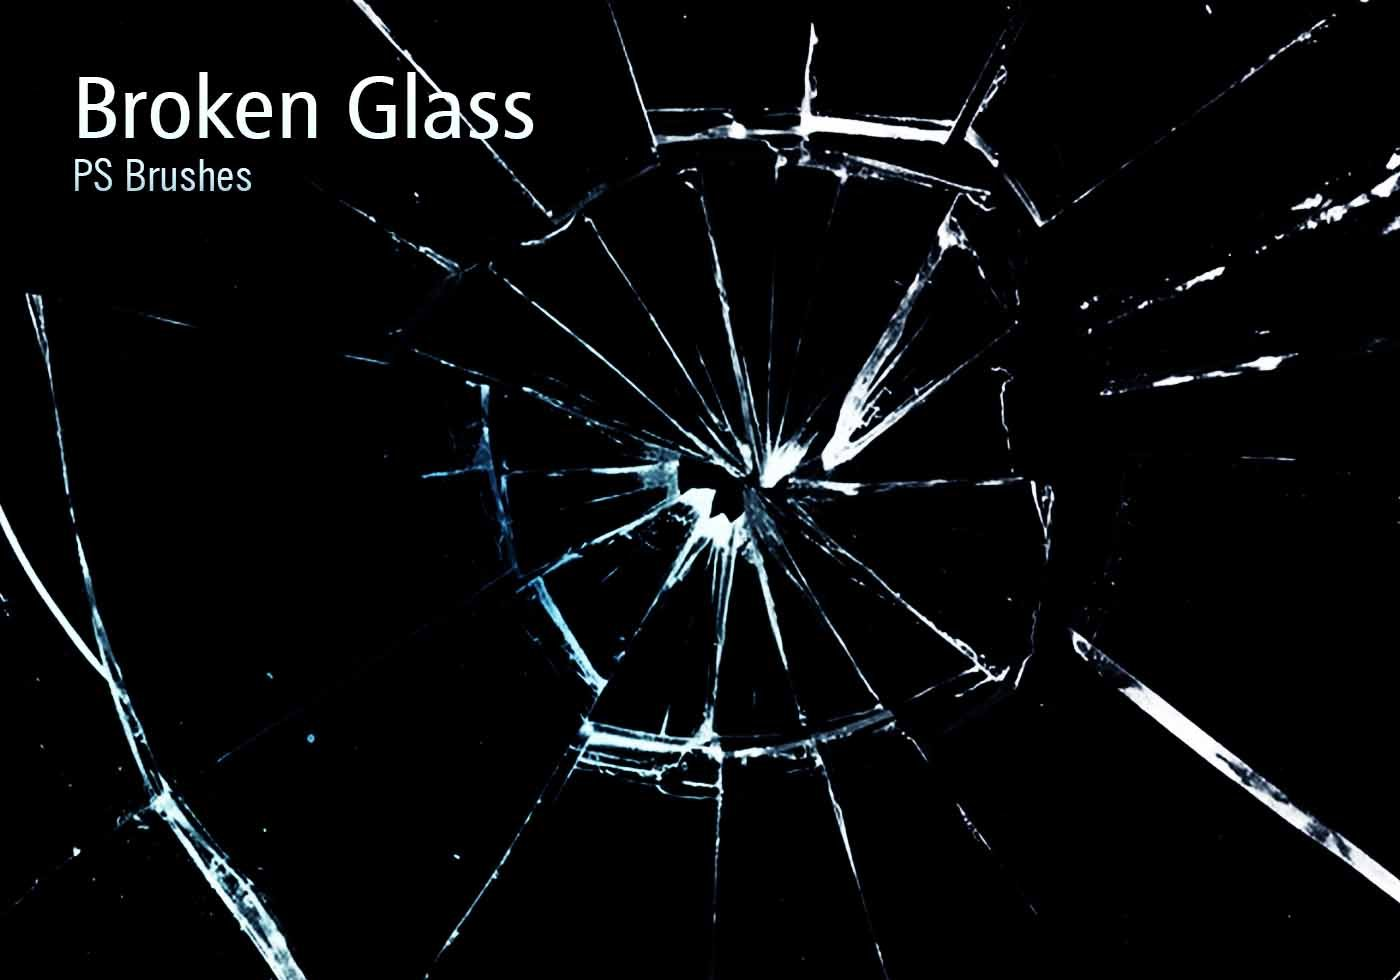 20 broken glass ps brushes abrvol10 free photoshop